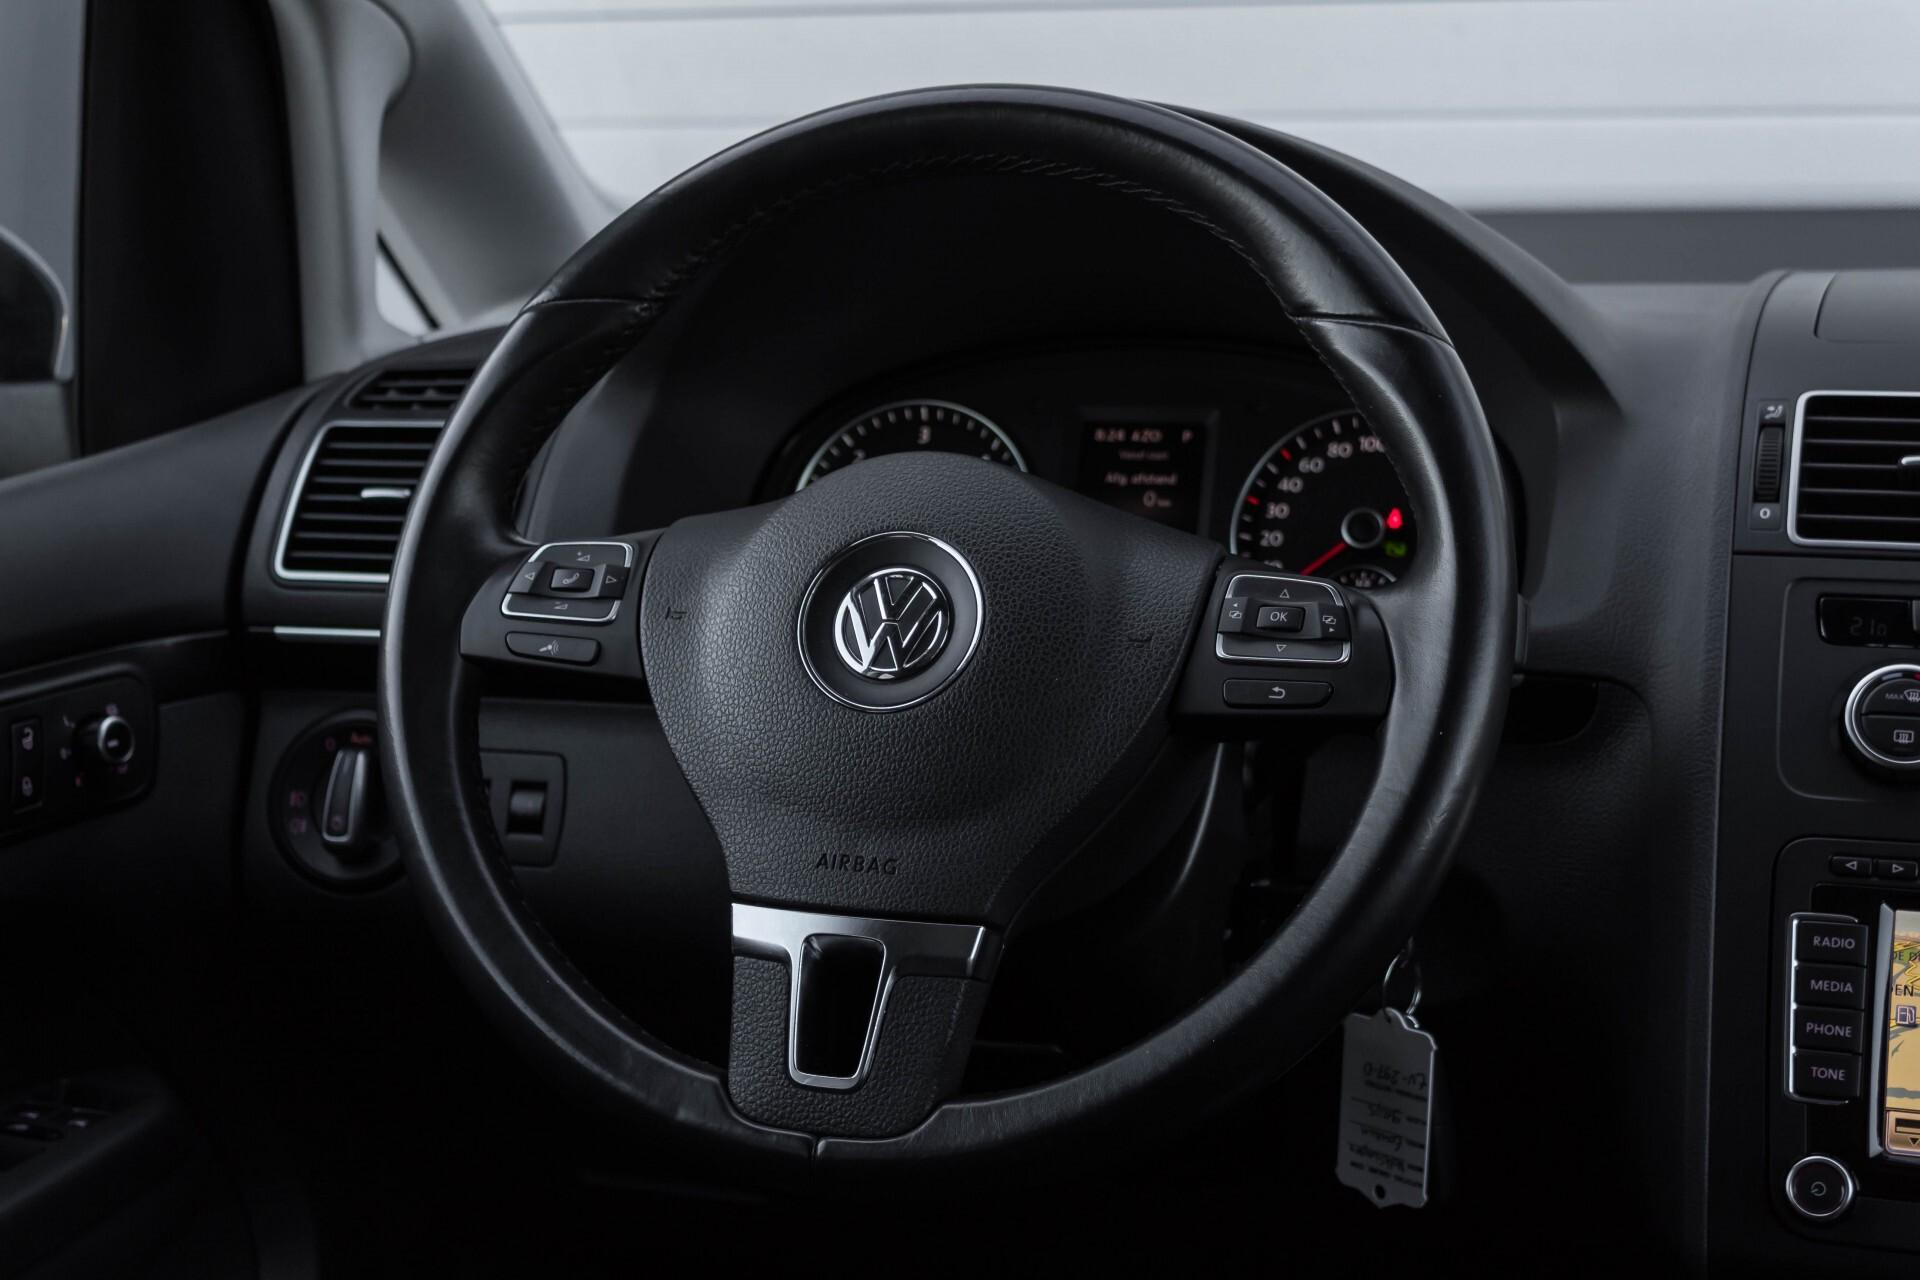 Volkswagen Touran 2.0 TDI Highline 7Persoons 177pk Panorama/Leder/Navi/Camera/Verw-Stln/Trhk/ECC/Xenon Aut Foto 10